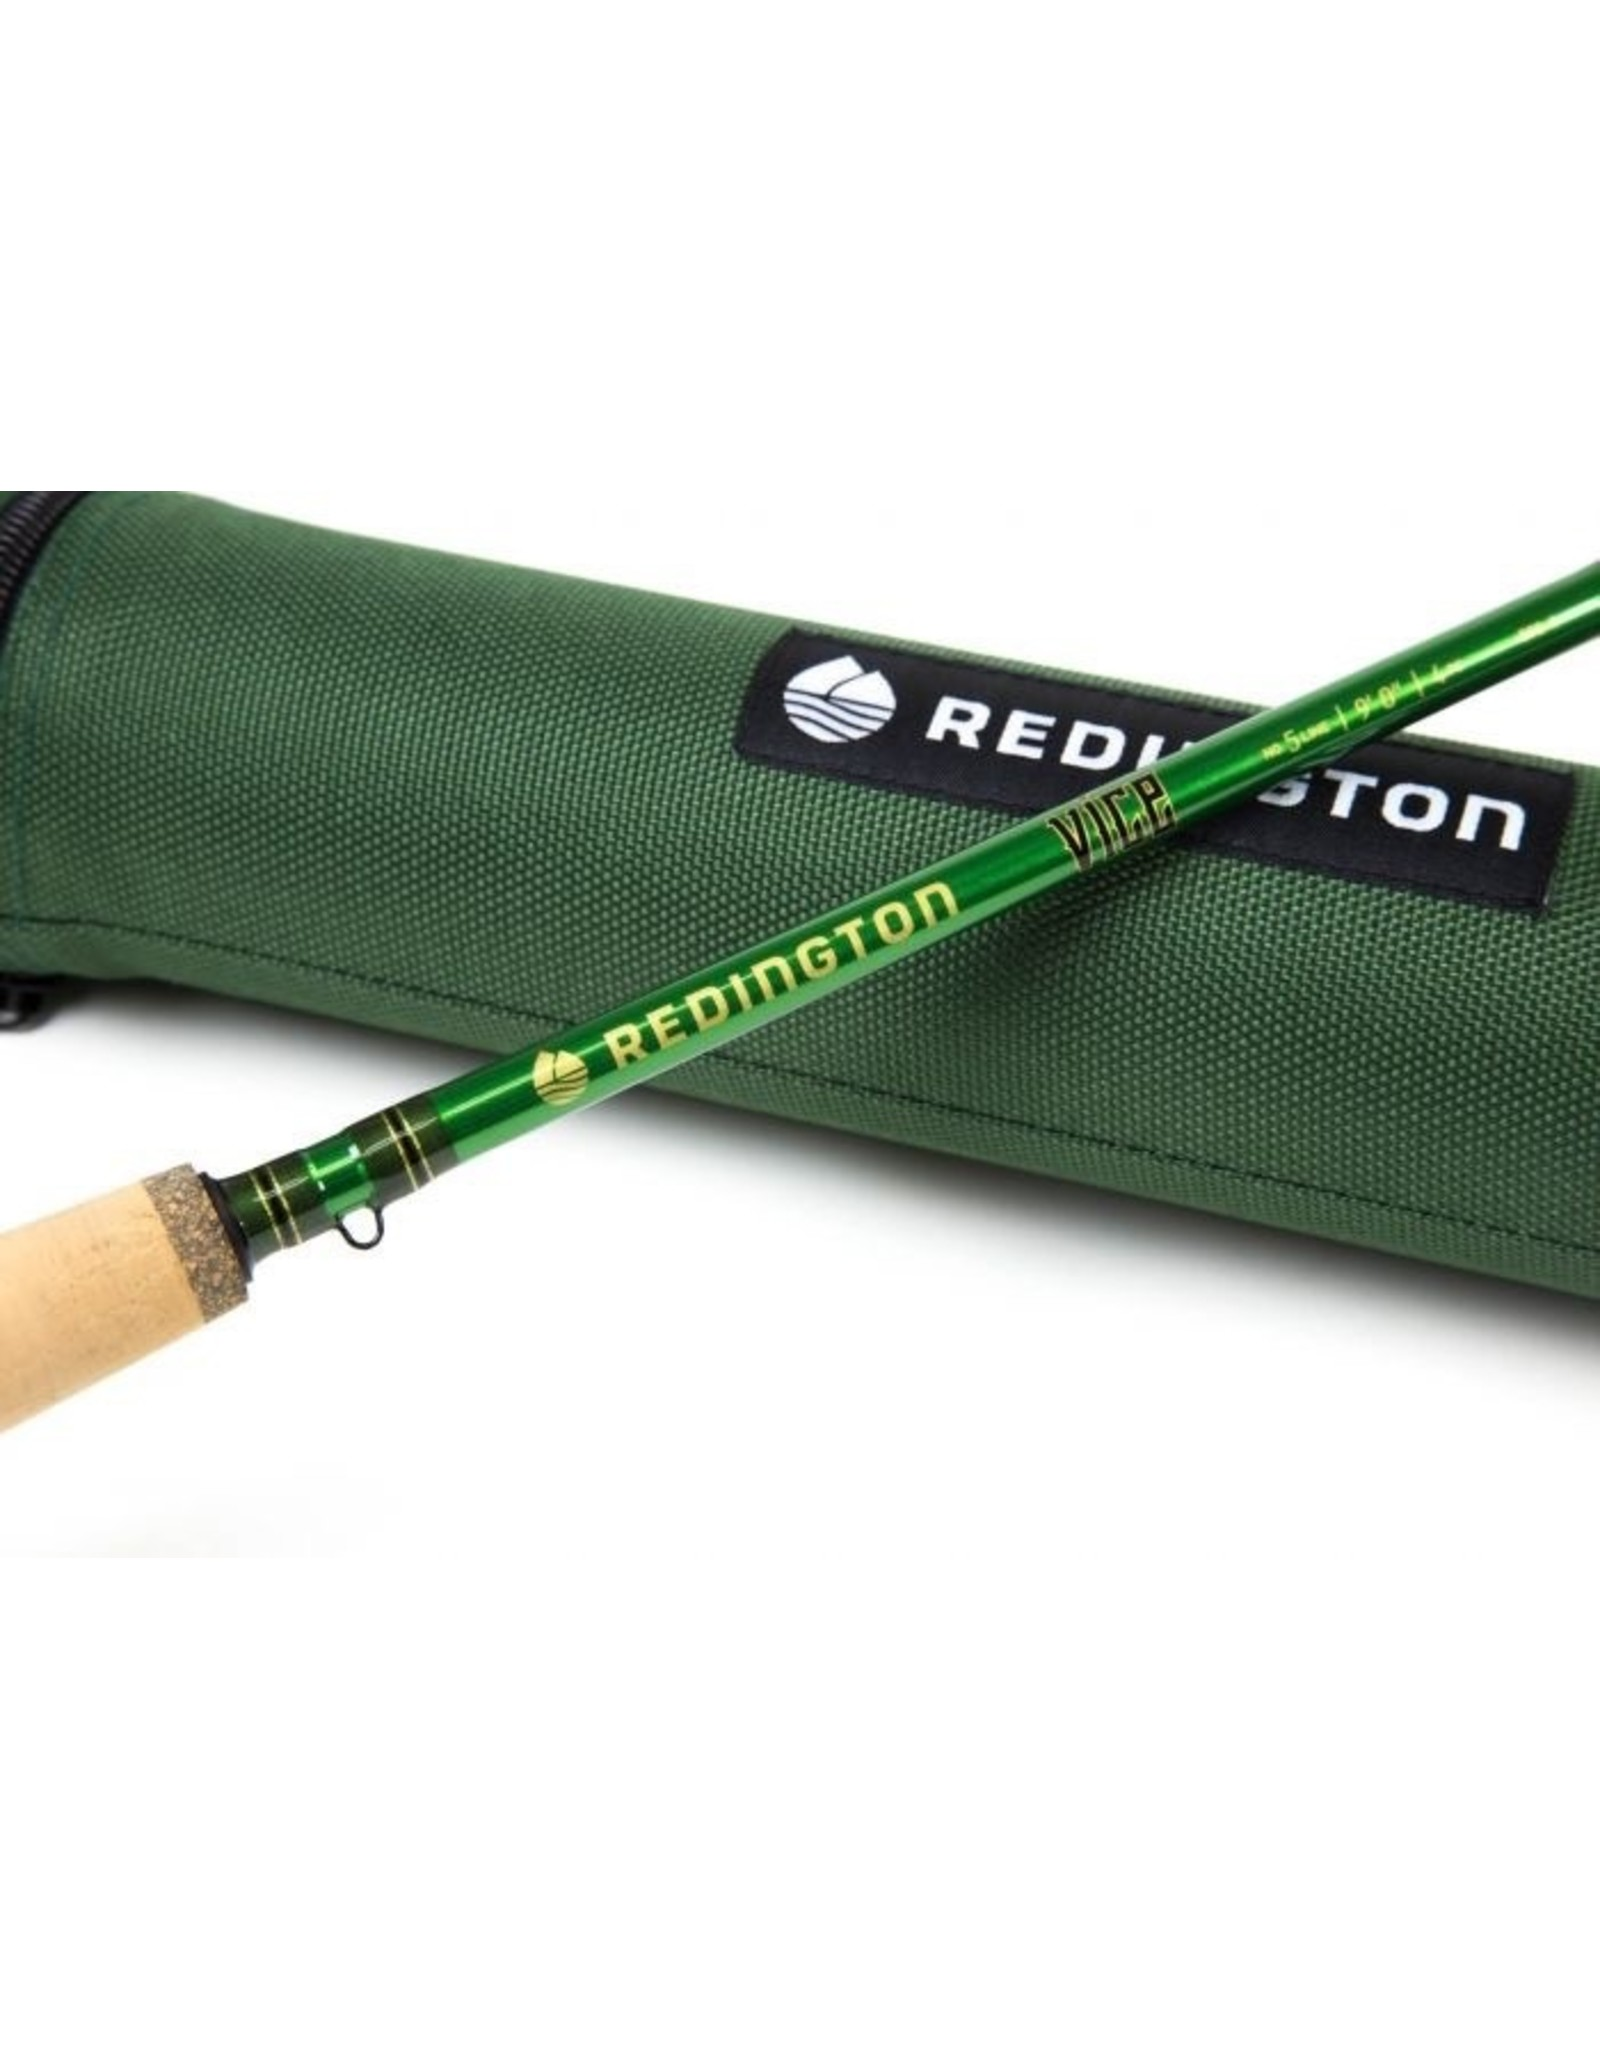 Redington Redington Vice 9' 5wt Fly Rod (4pc)